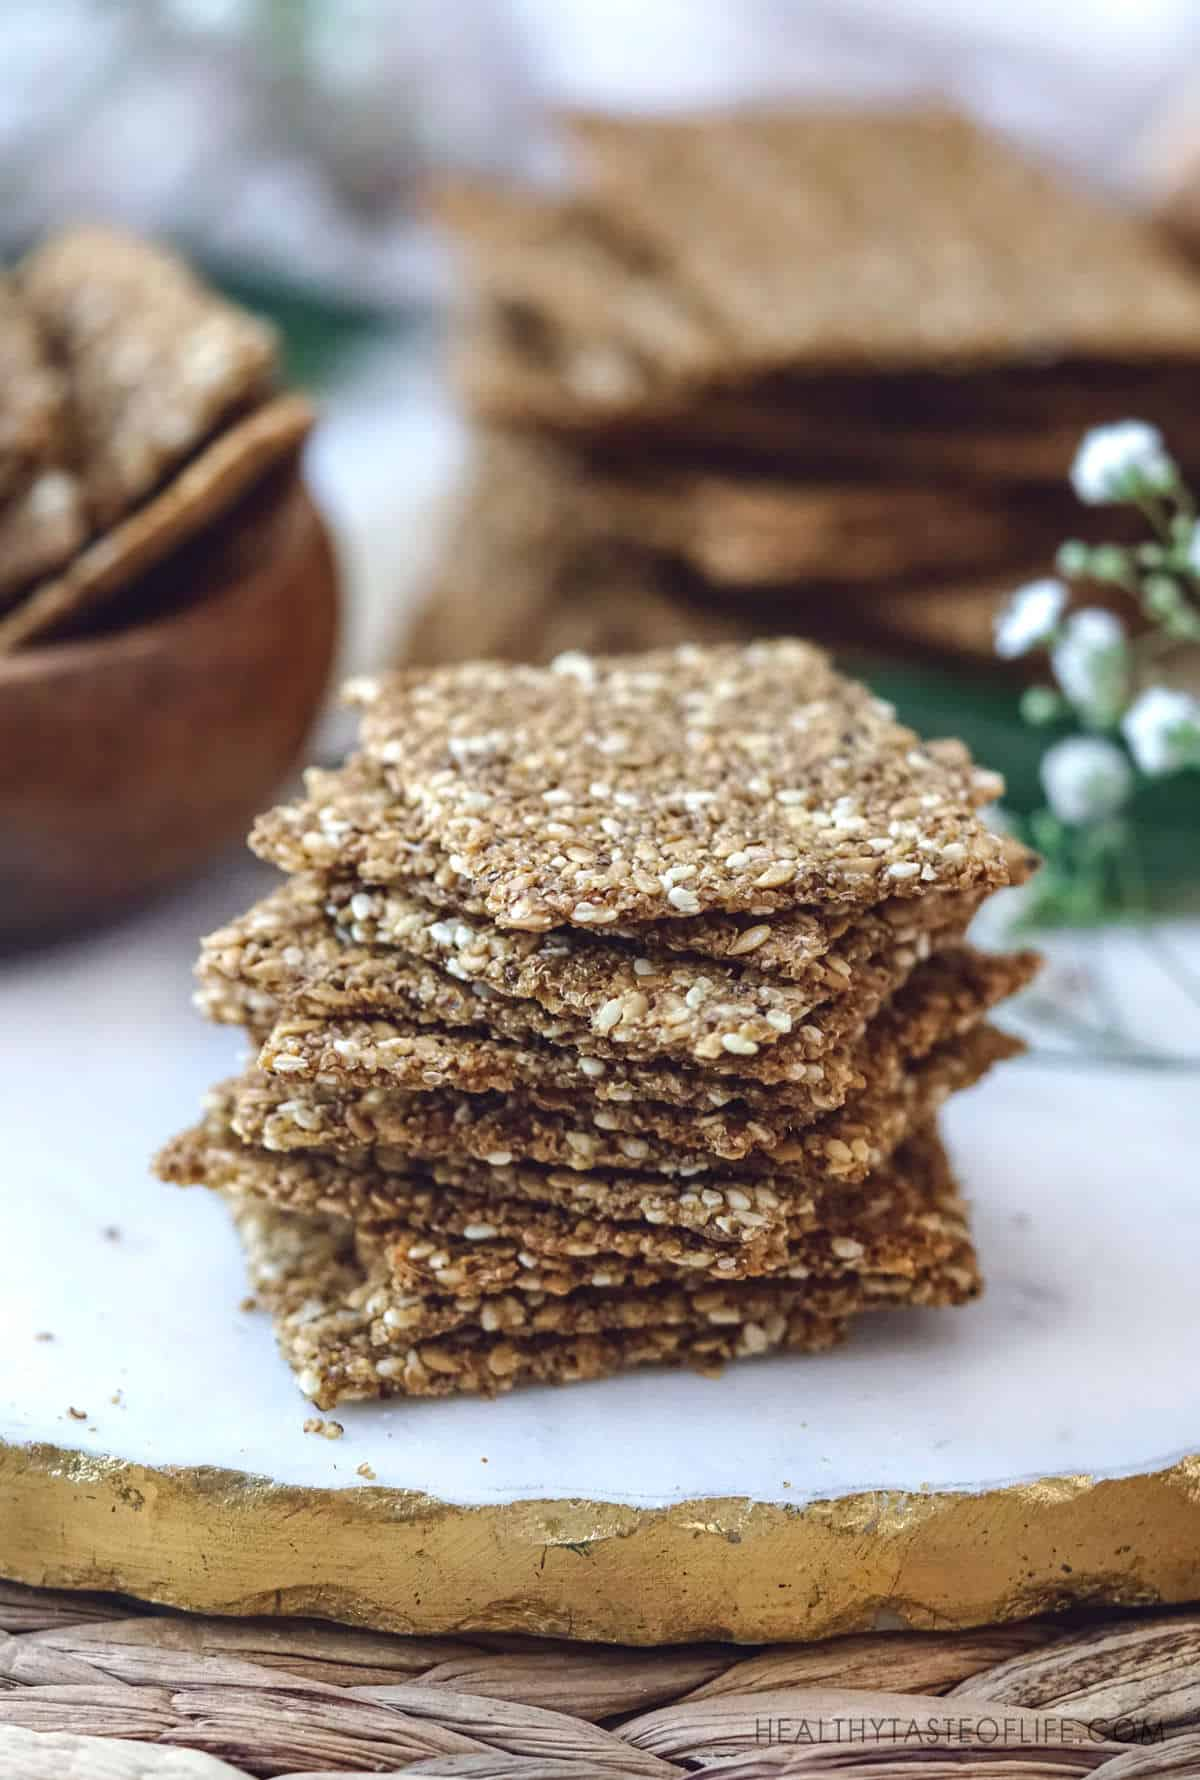 Vegan gluten free seed crackers with puffed amaranth.